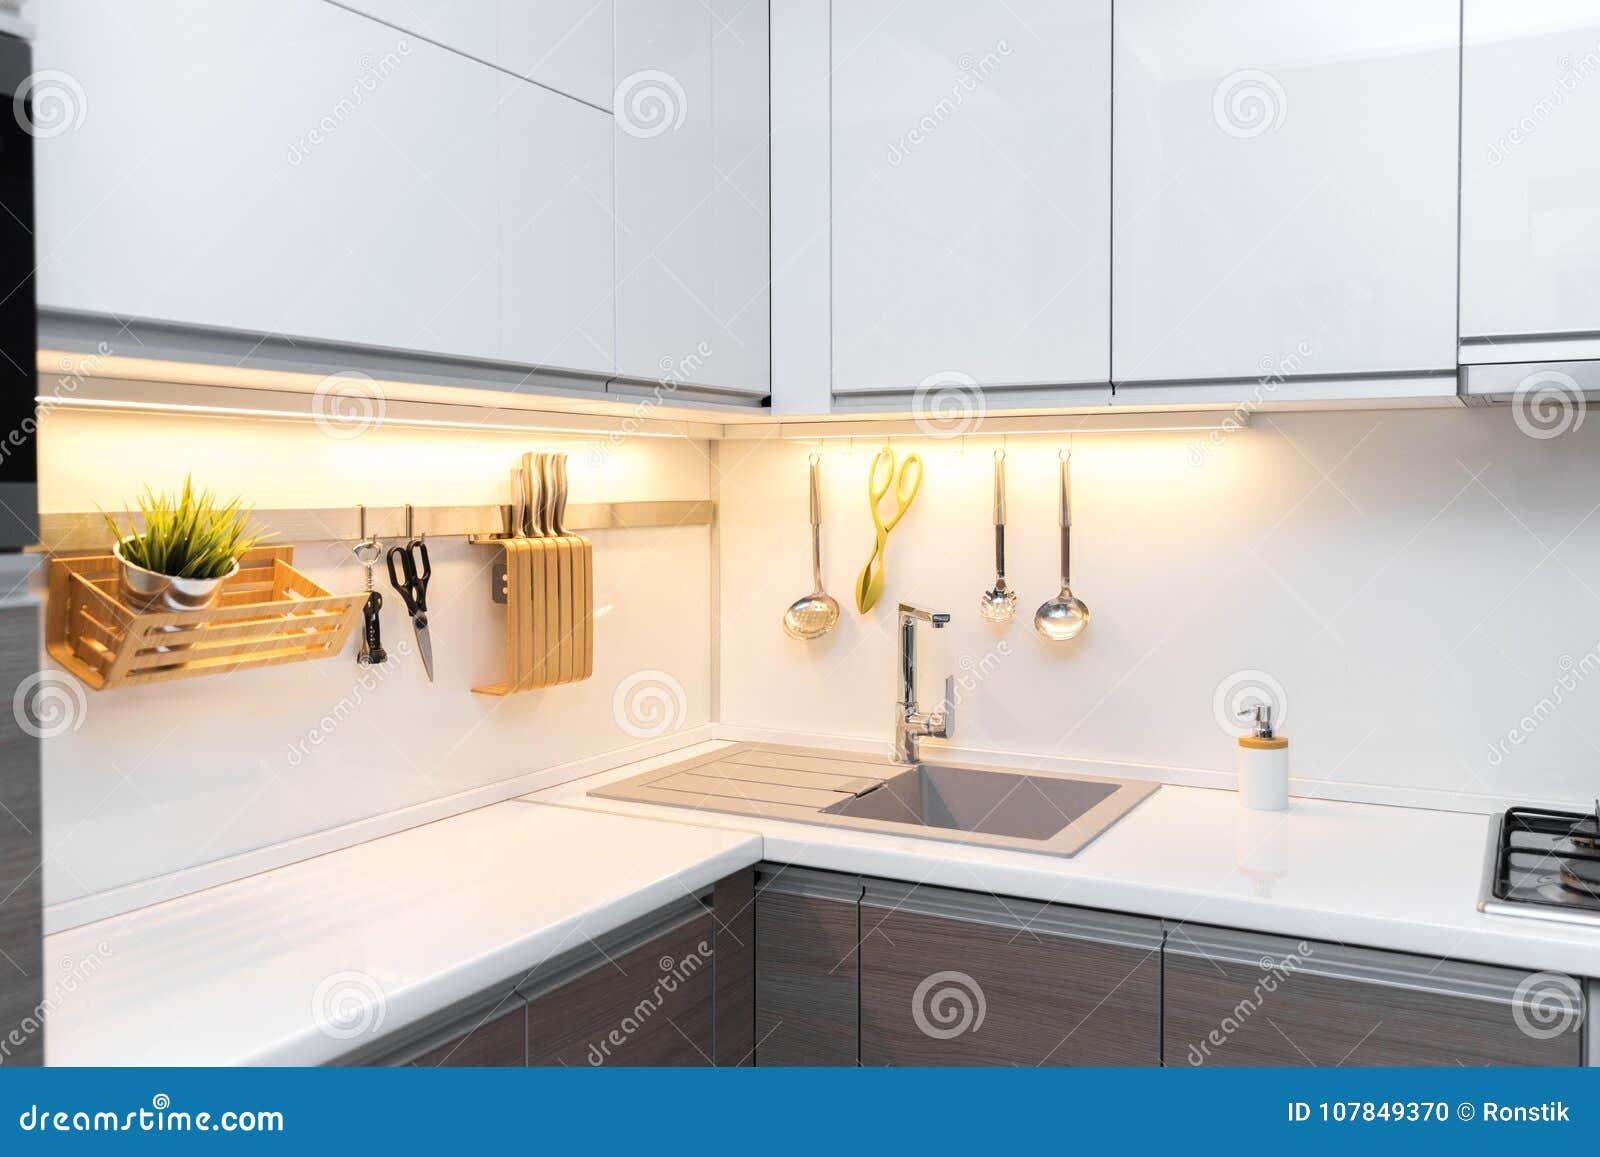 Lampada cucina fresco illuminazione della cucina in agriturismo